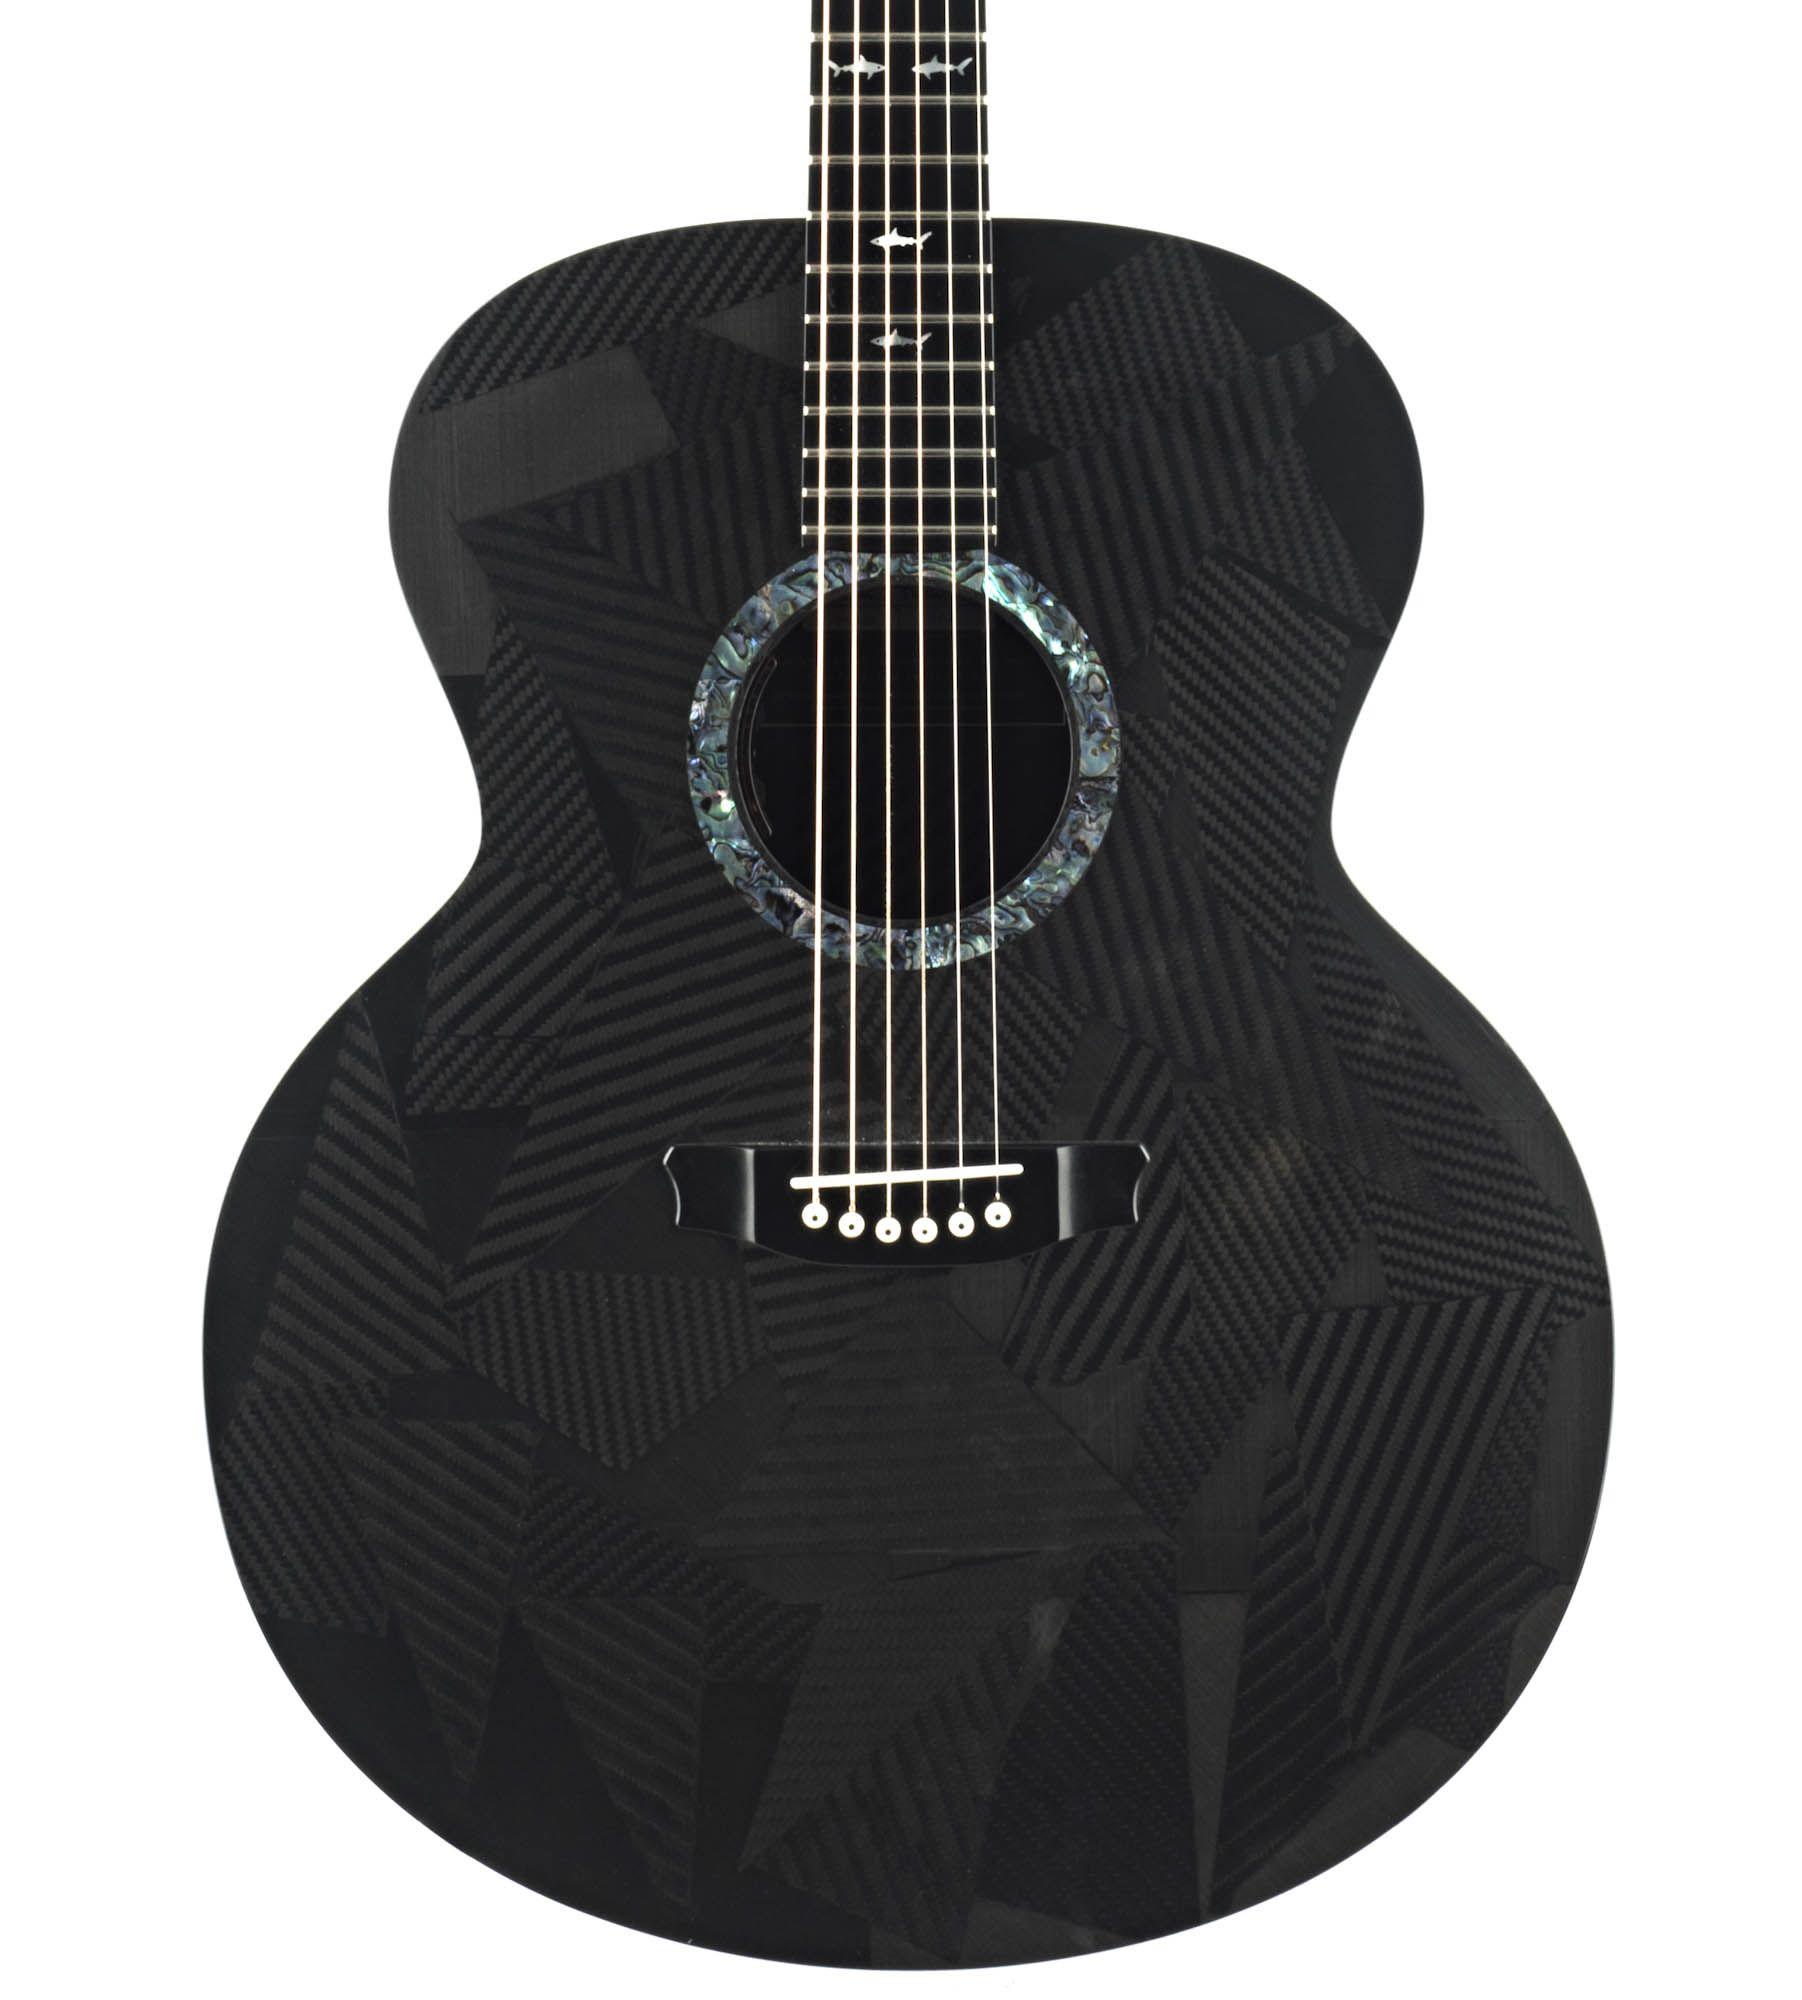 Rainsong Black Ice Jumbo Carbon Fiber Acoustic Guitar Carbon Fiber Acoustic Acoustic Guitar